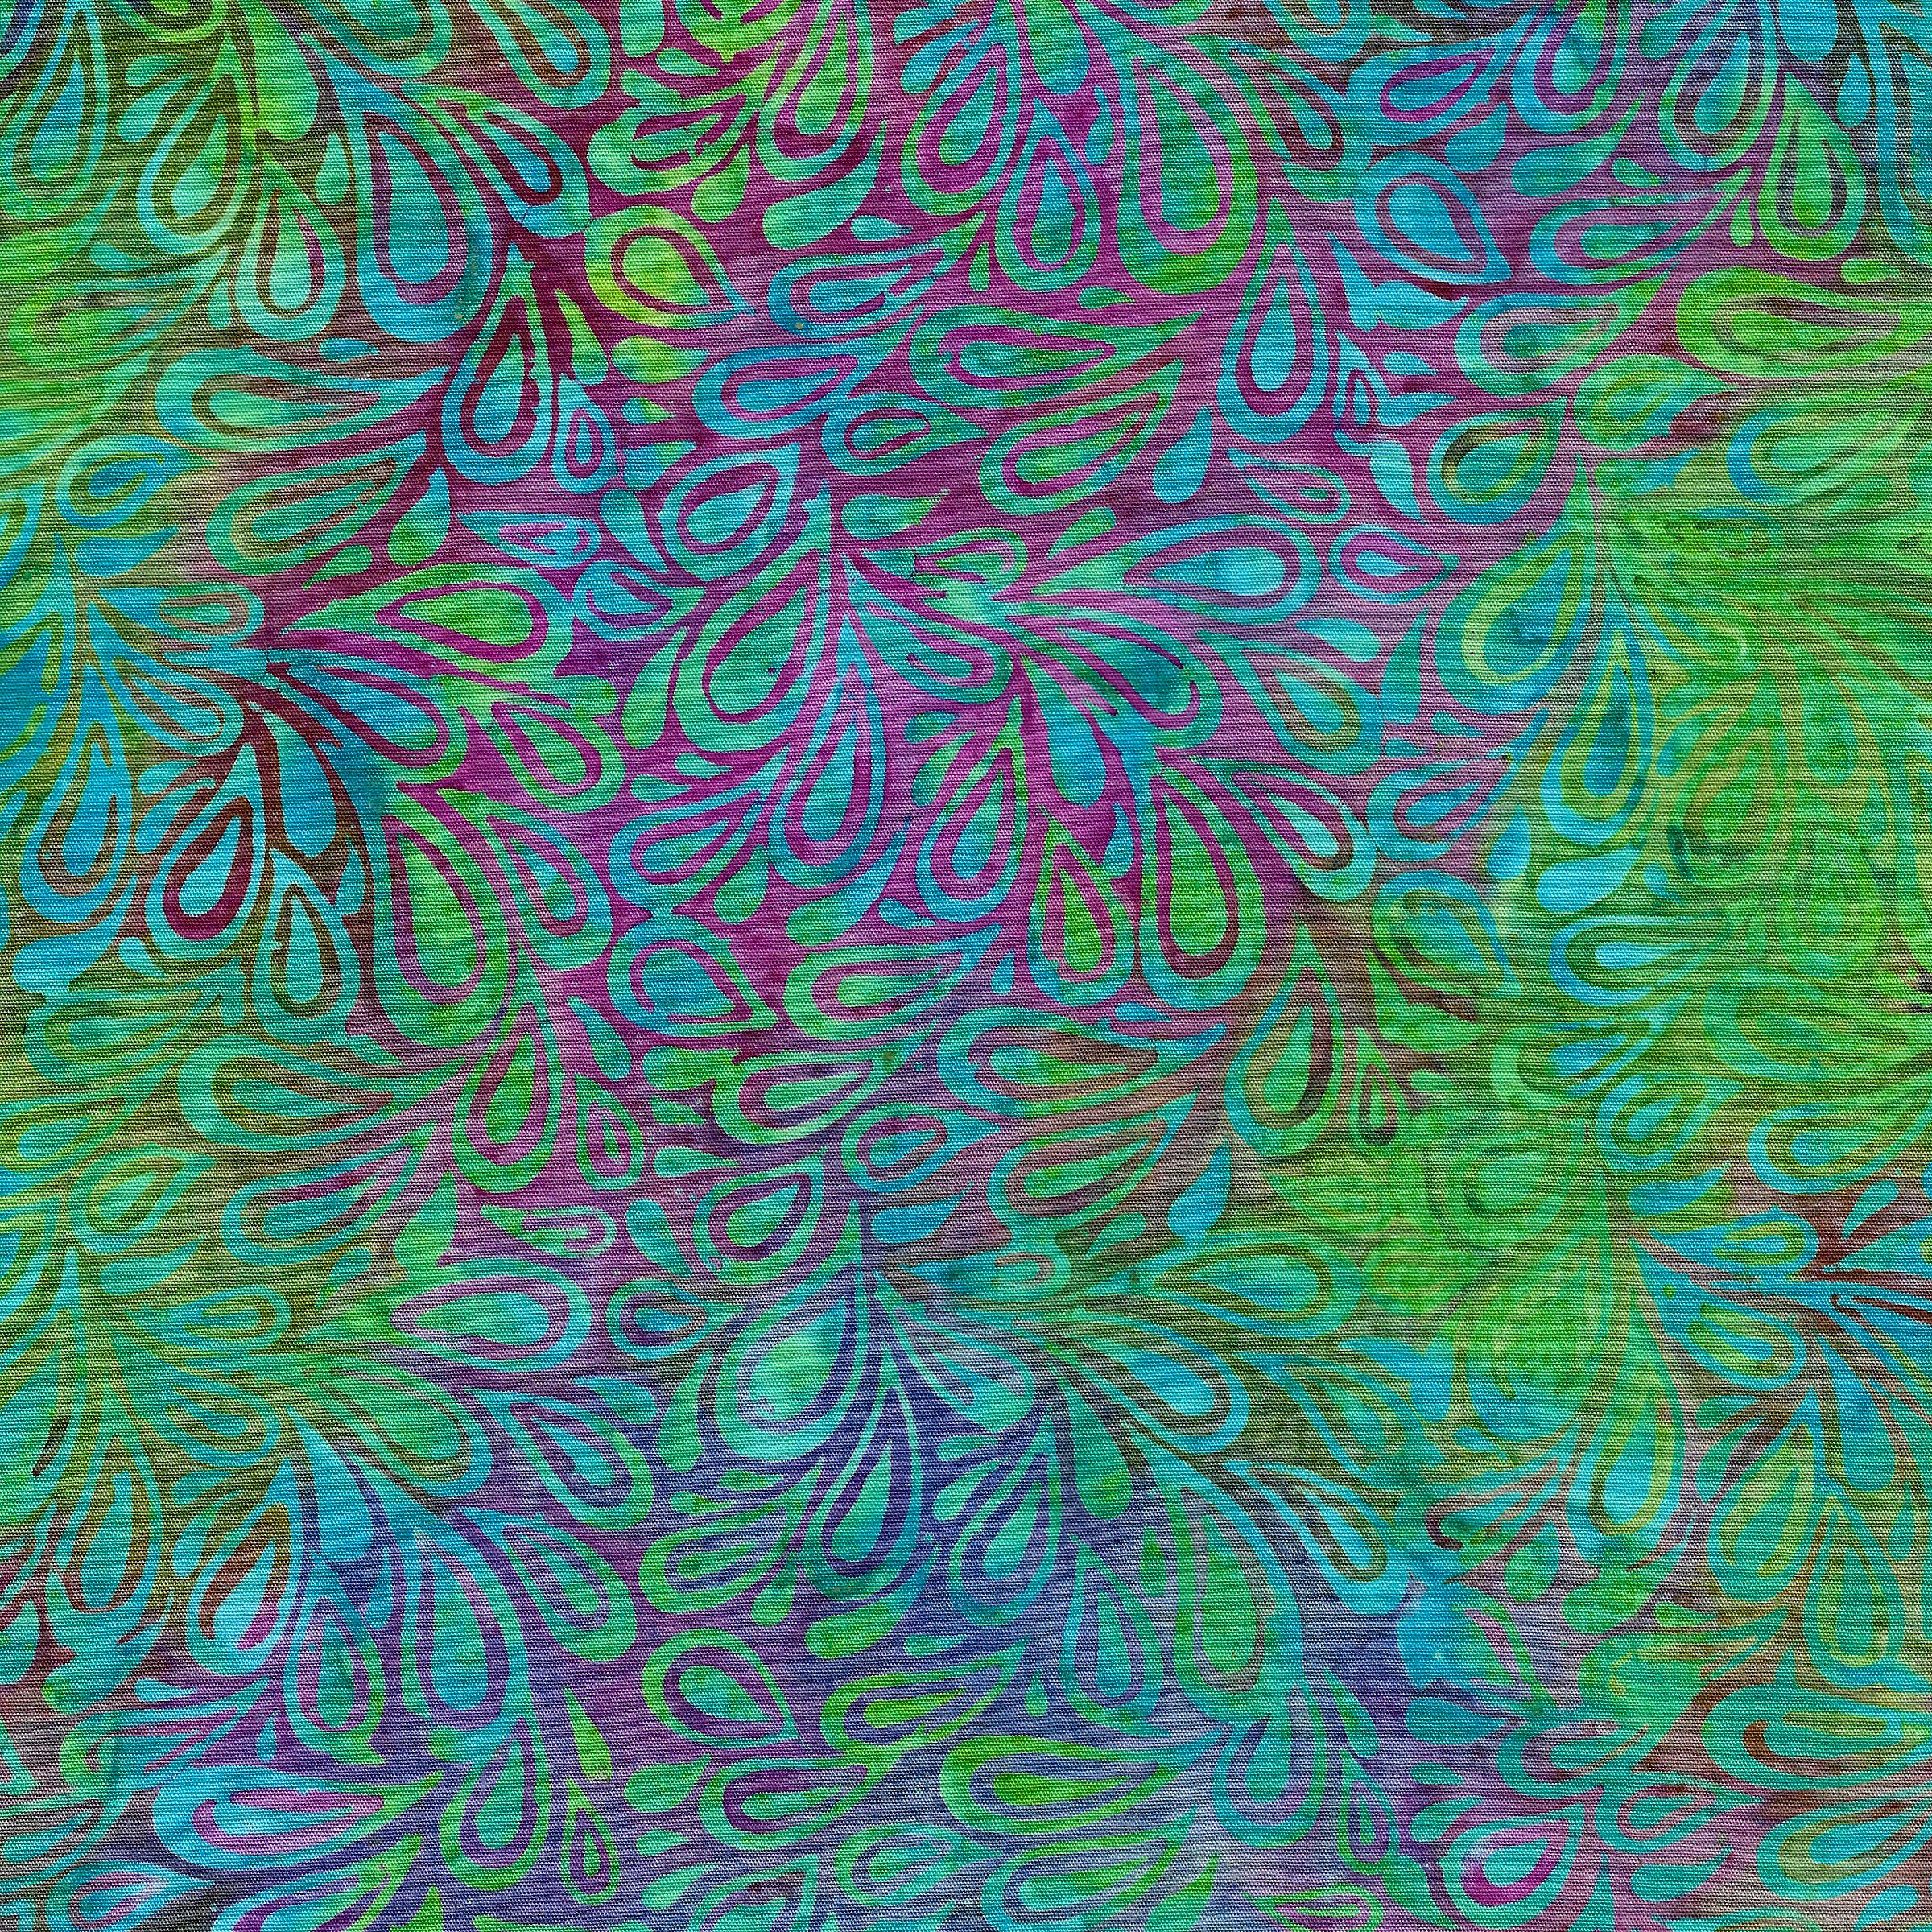 121820883 / Paisley Drop -Mardigras